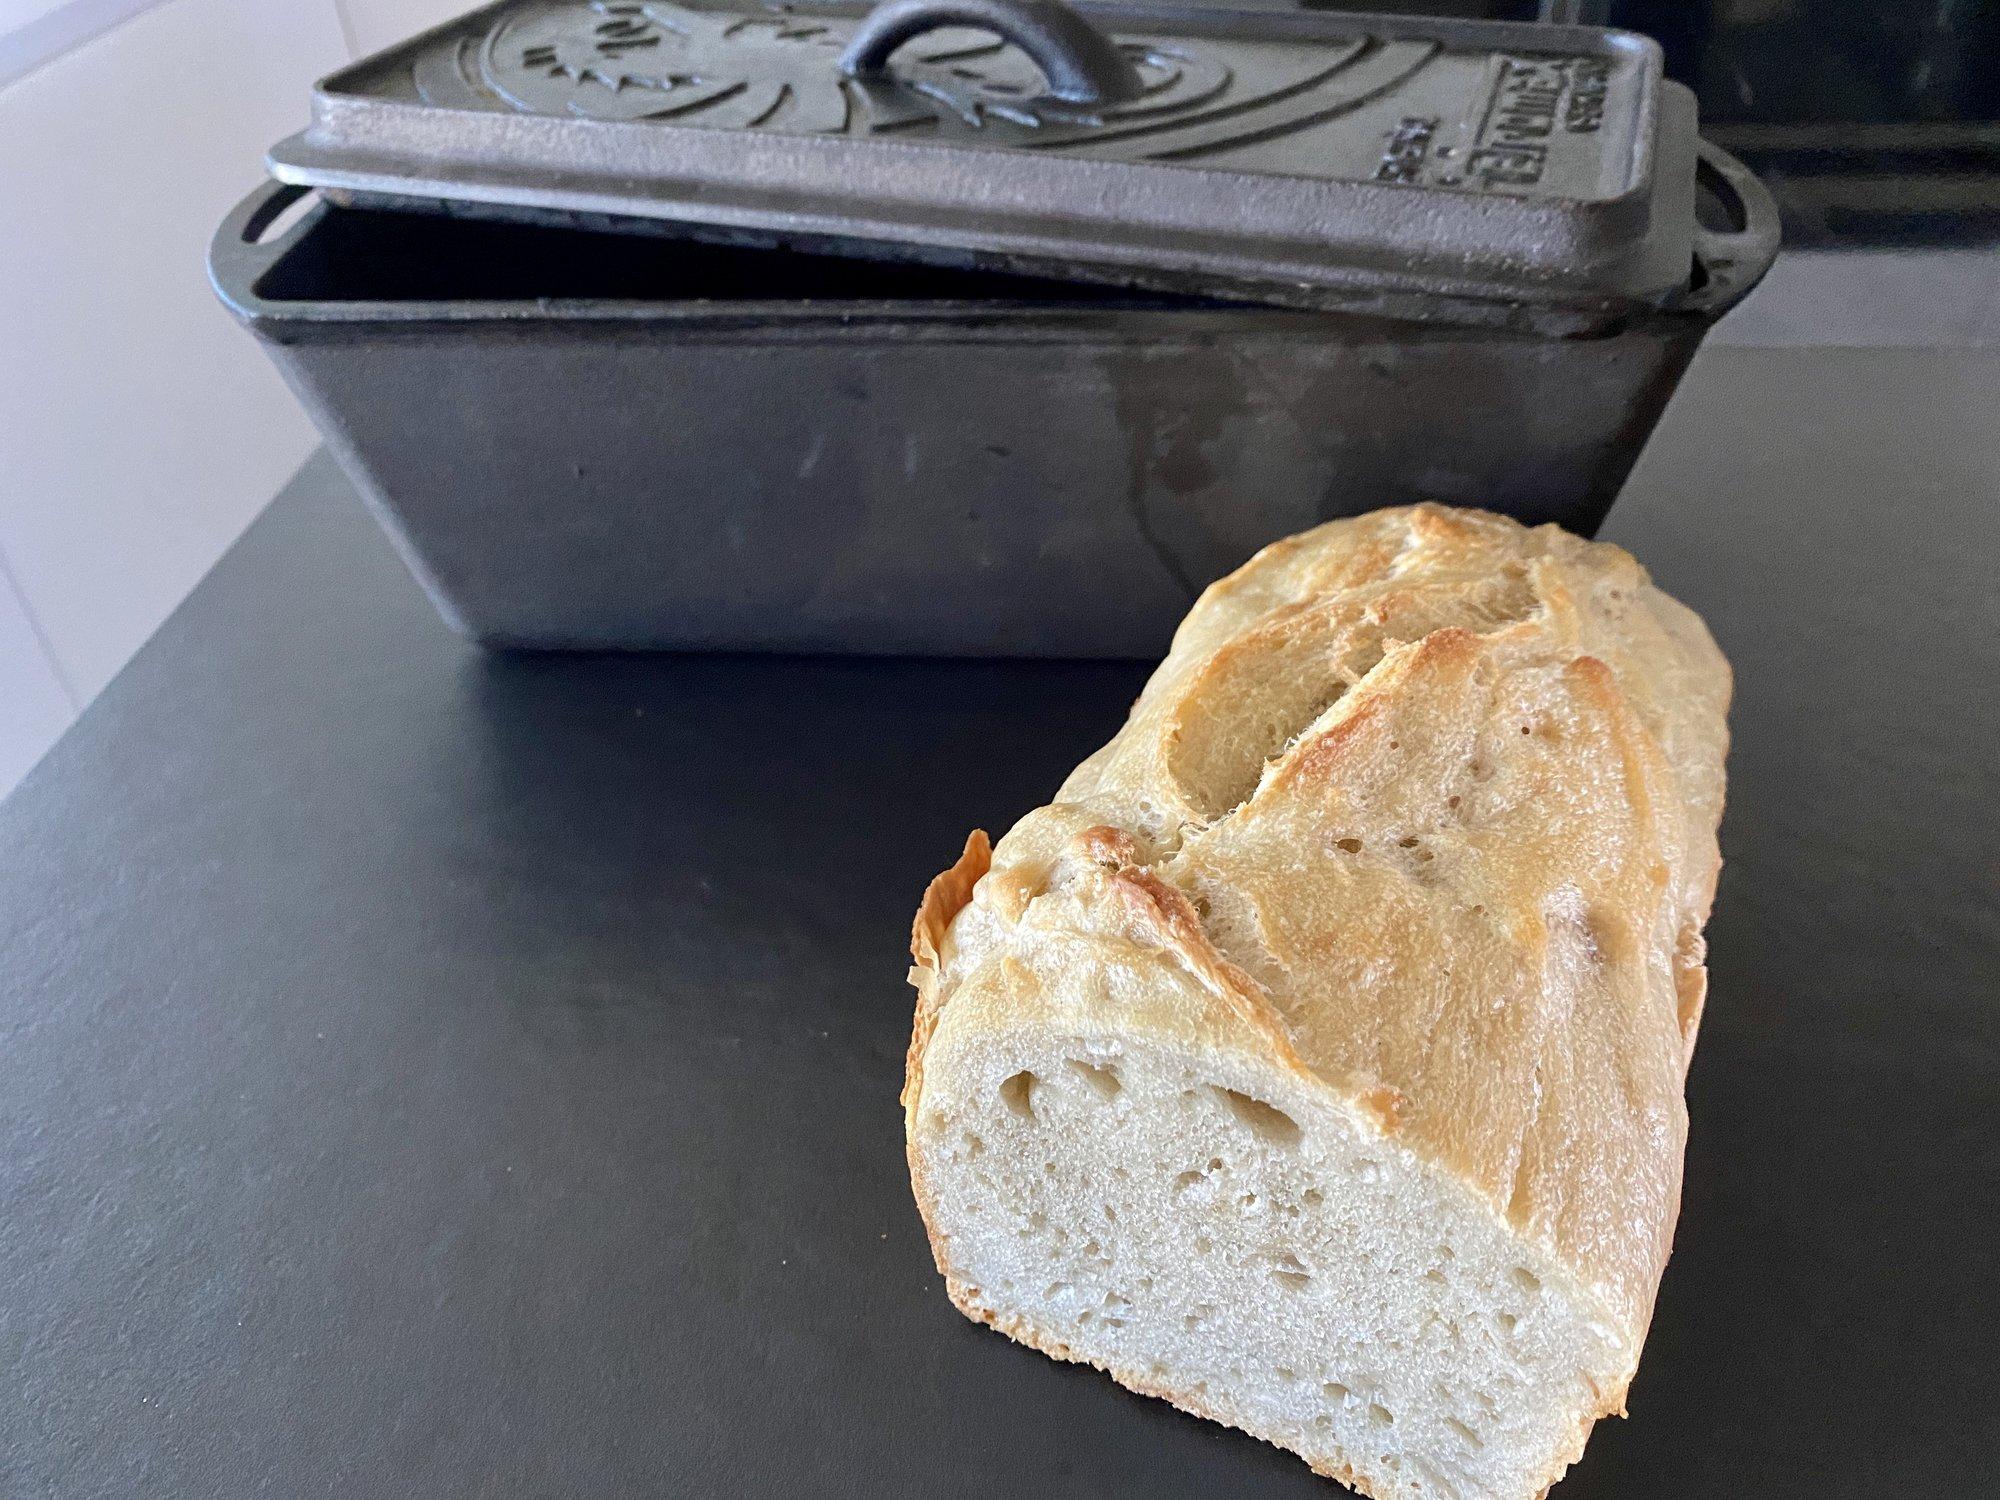 Odenwälder Brot.jpg